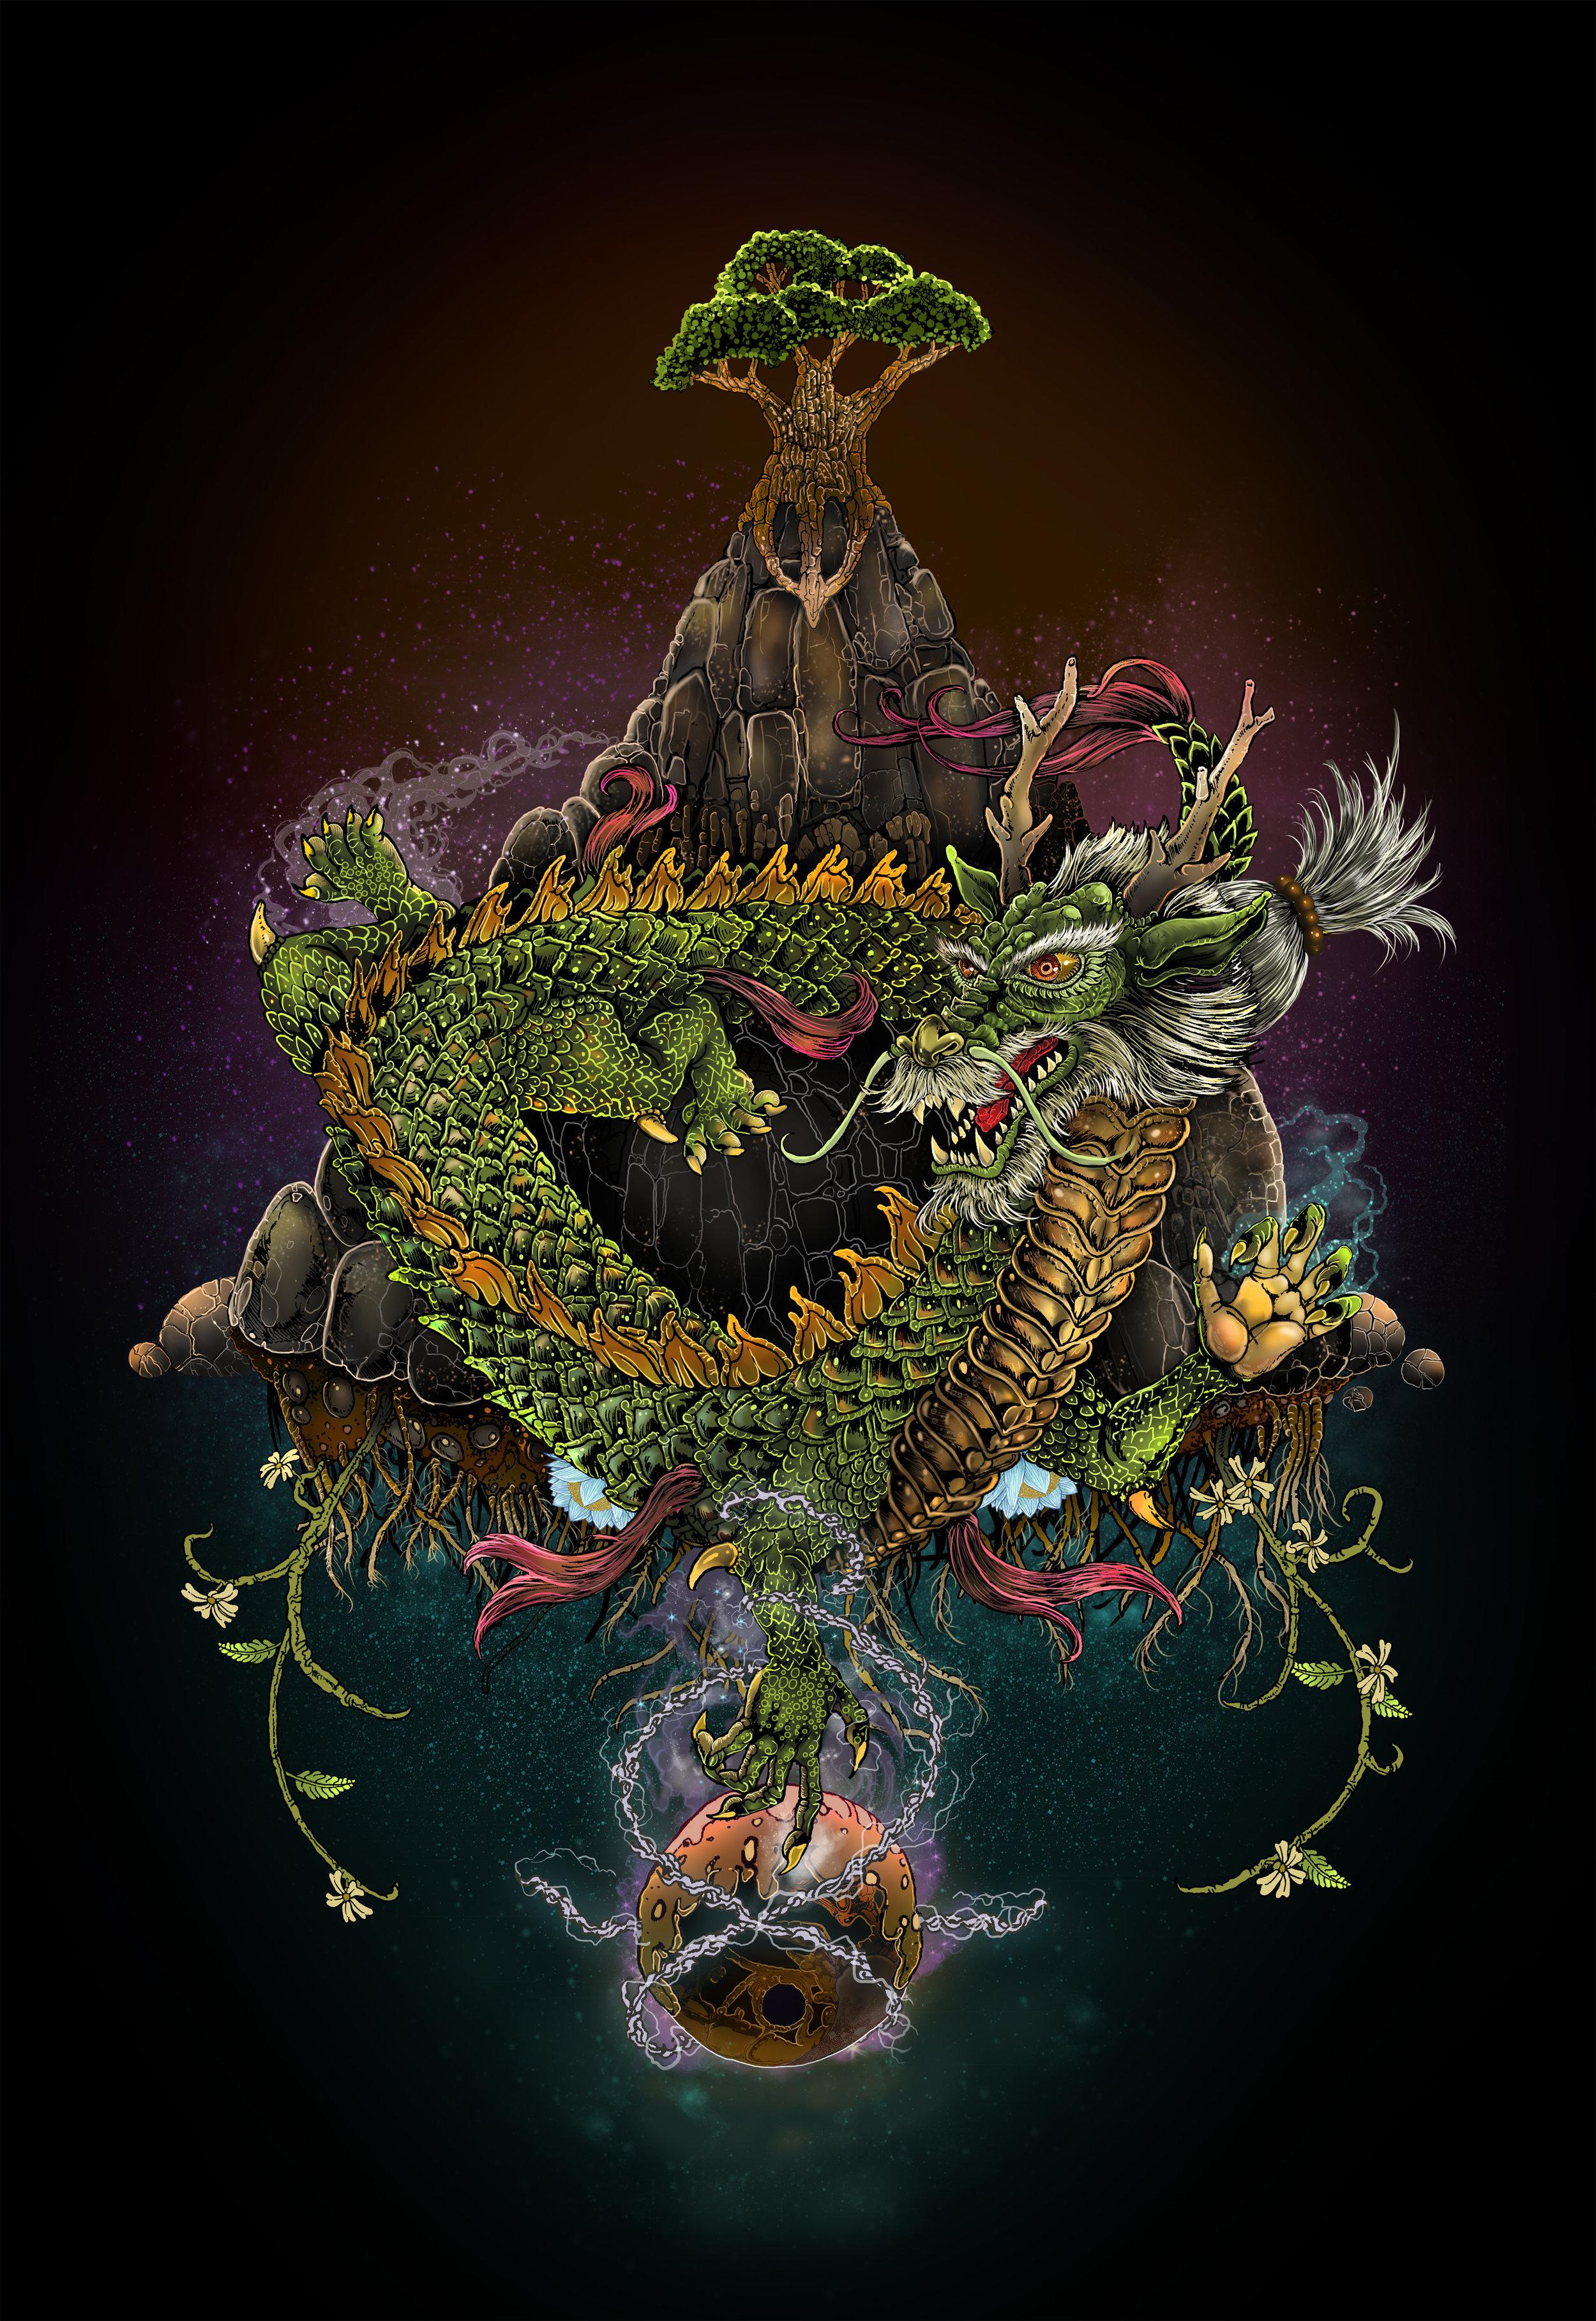 001 The Earth Dragon for illus.jpg